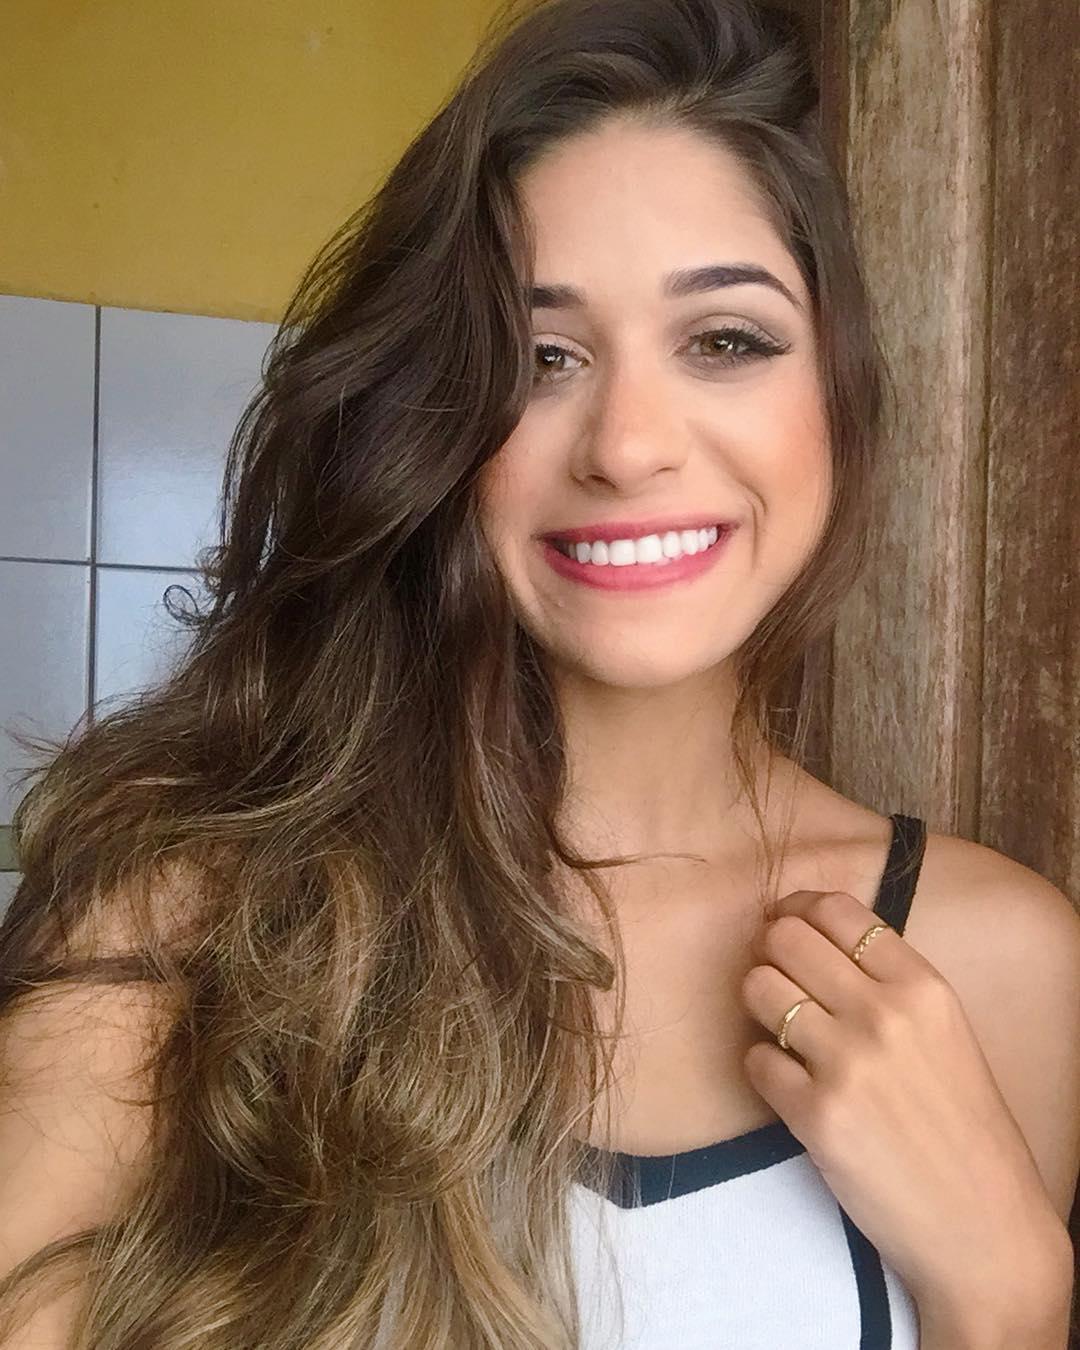 anna carolina sousa, miss maranhao 2019. - Página 2 32040810